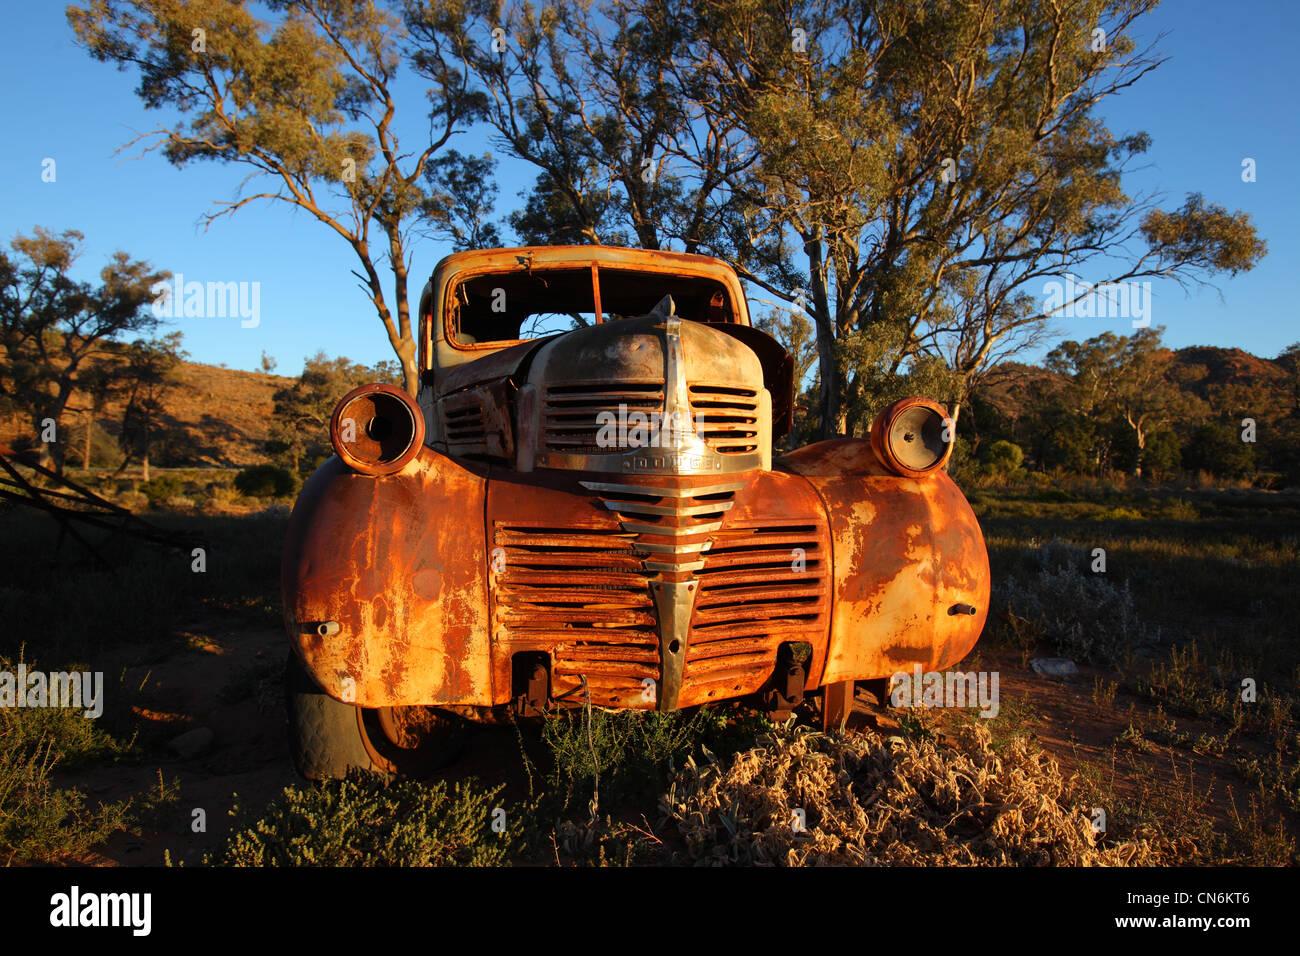 Old car in outback Australia. - Stock Image